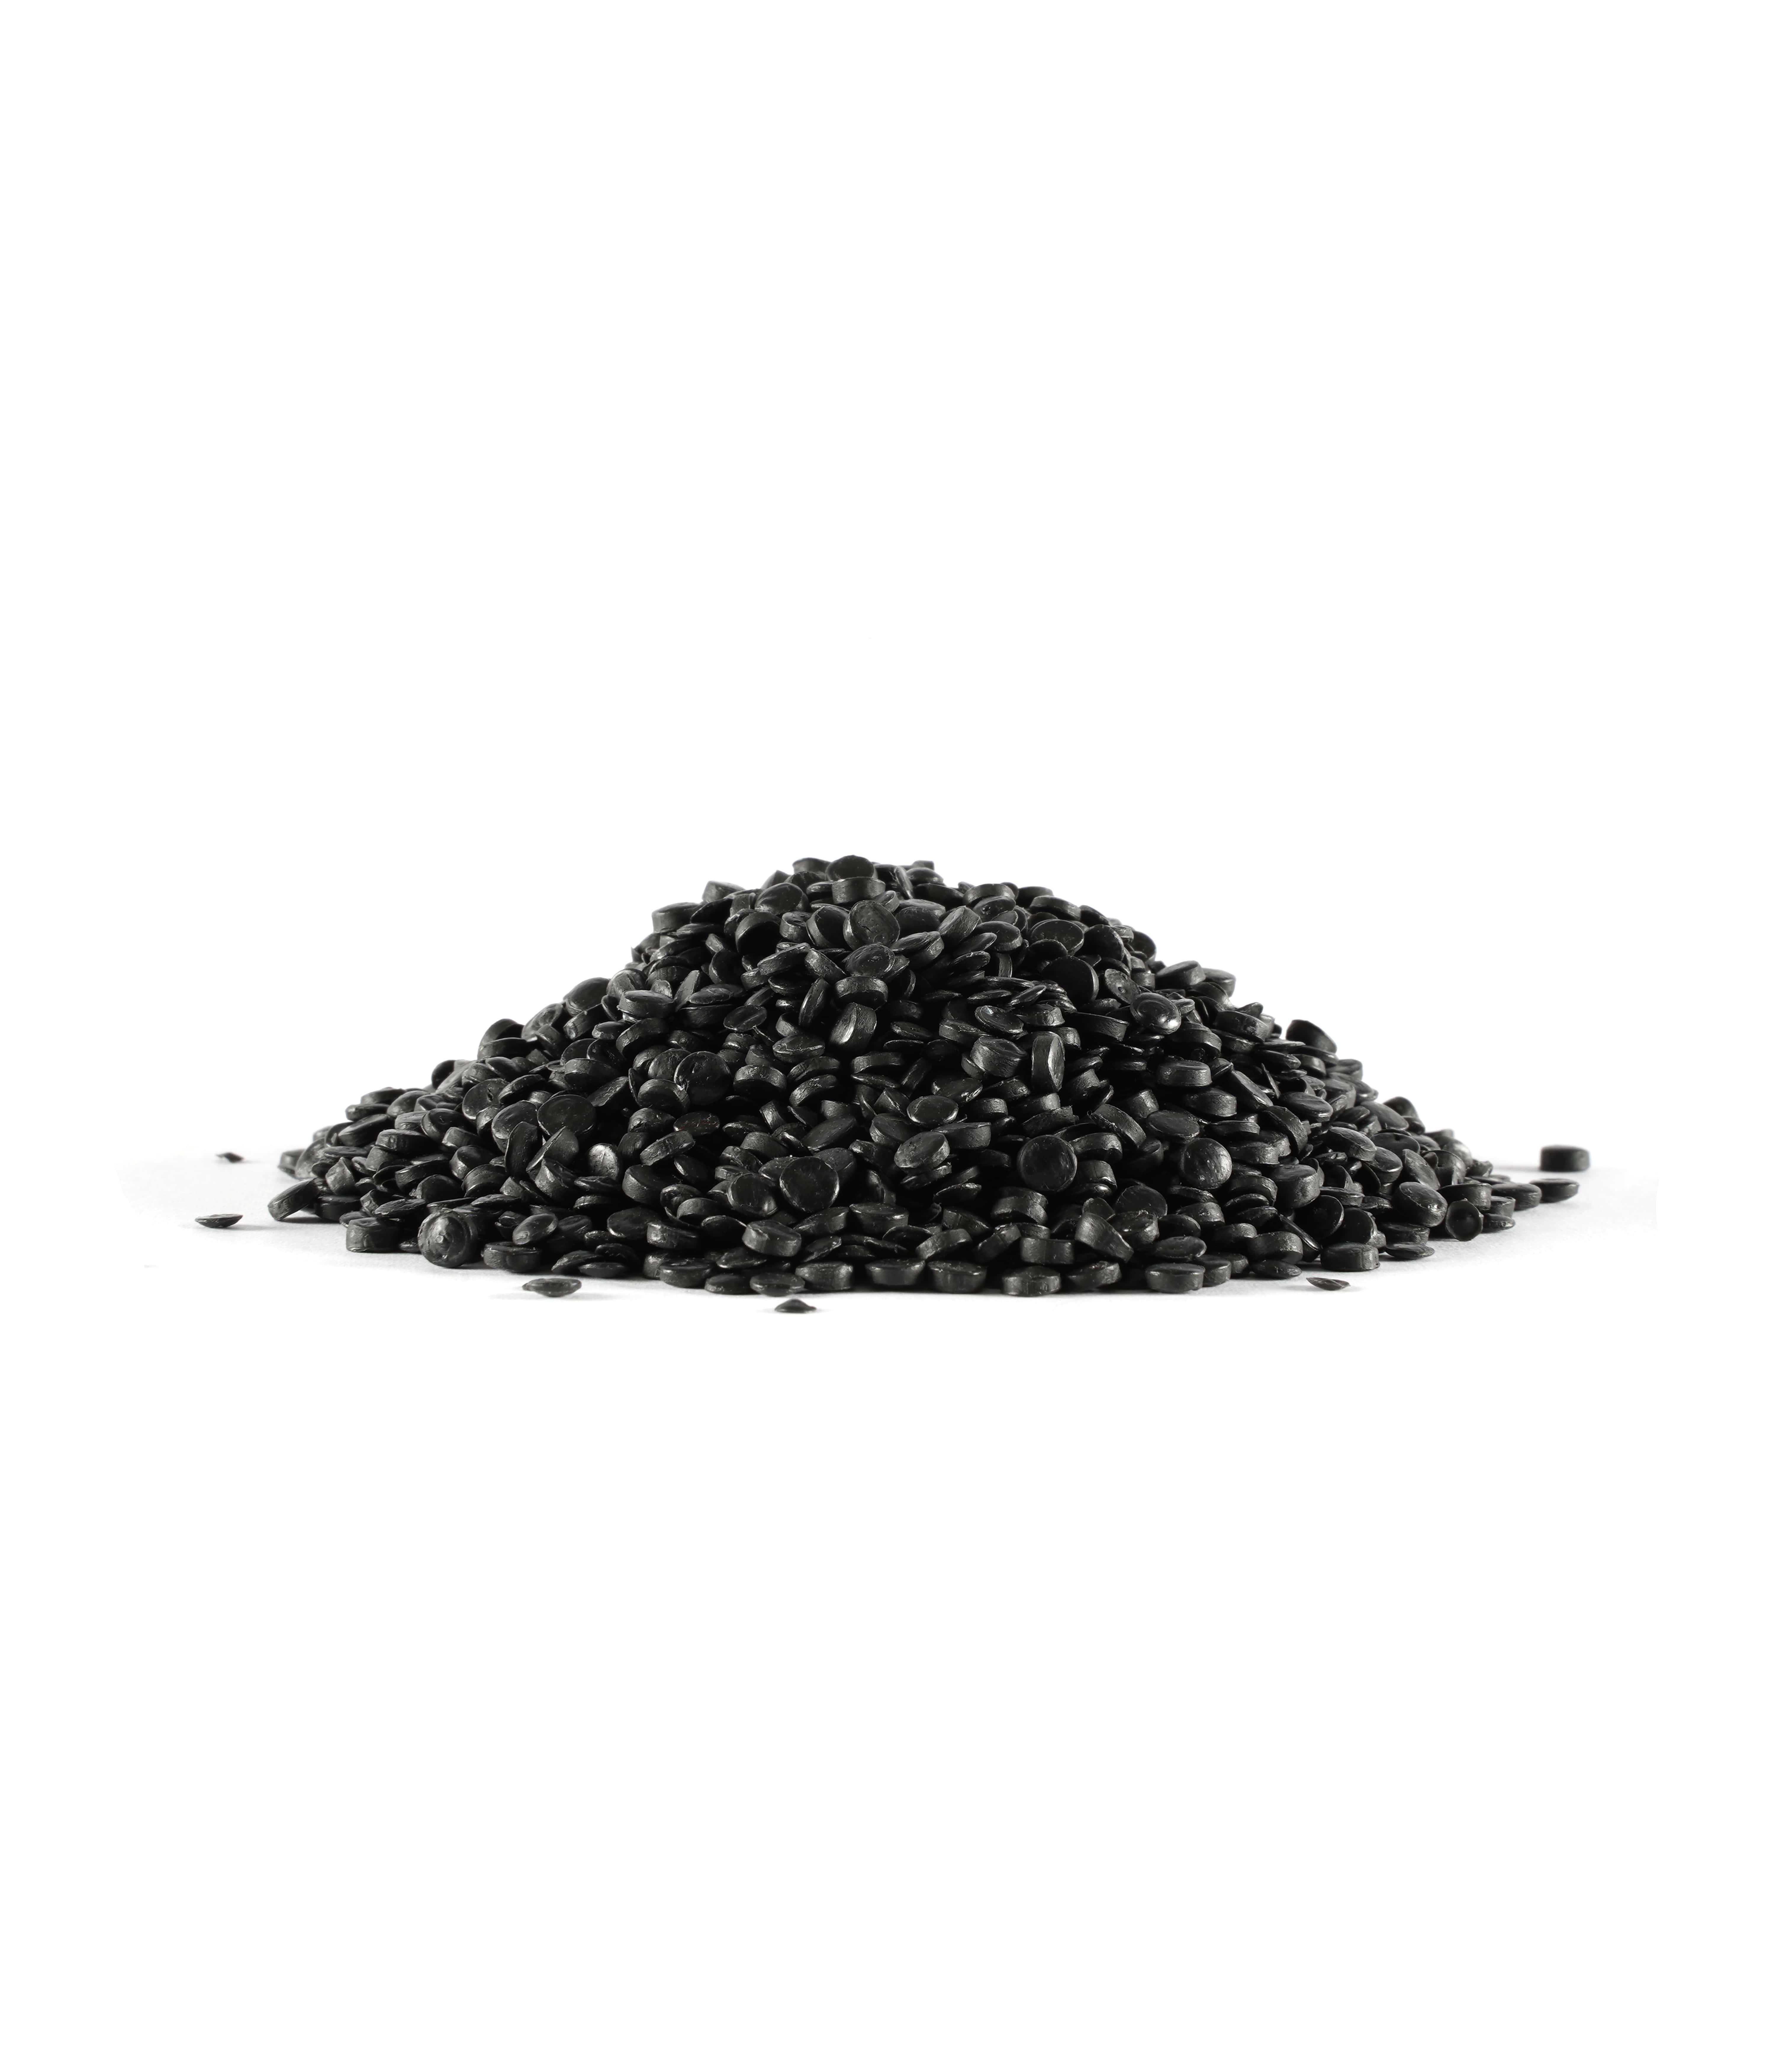 METIPLEN 002 HDPE 0,3 - 1 MFI BLACK